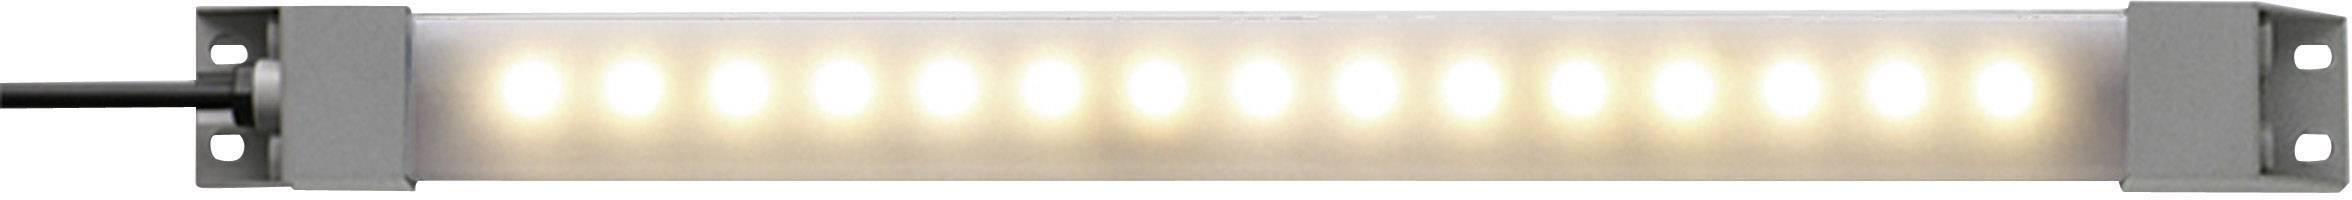 Idec LF1B-NC4P-2TLWW2-3M, teplá biela, 225 lm, 4.4 W, 24 V/DC